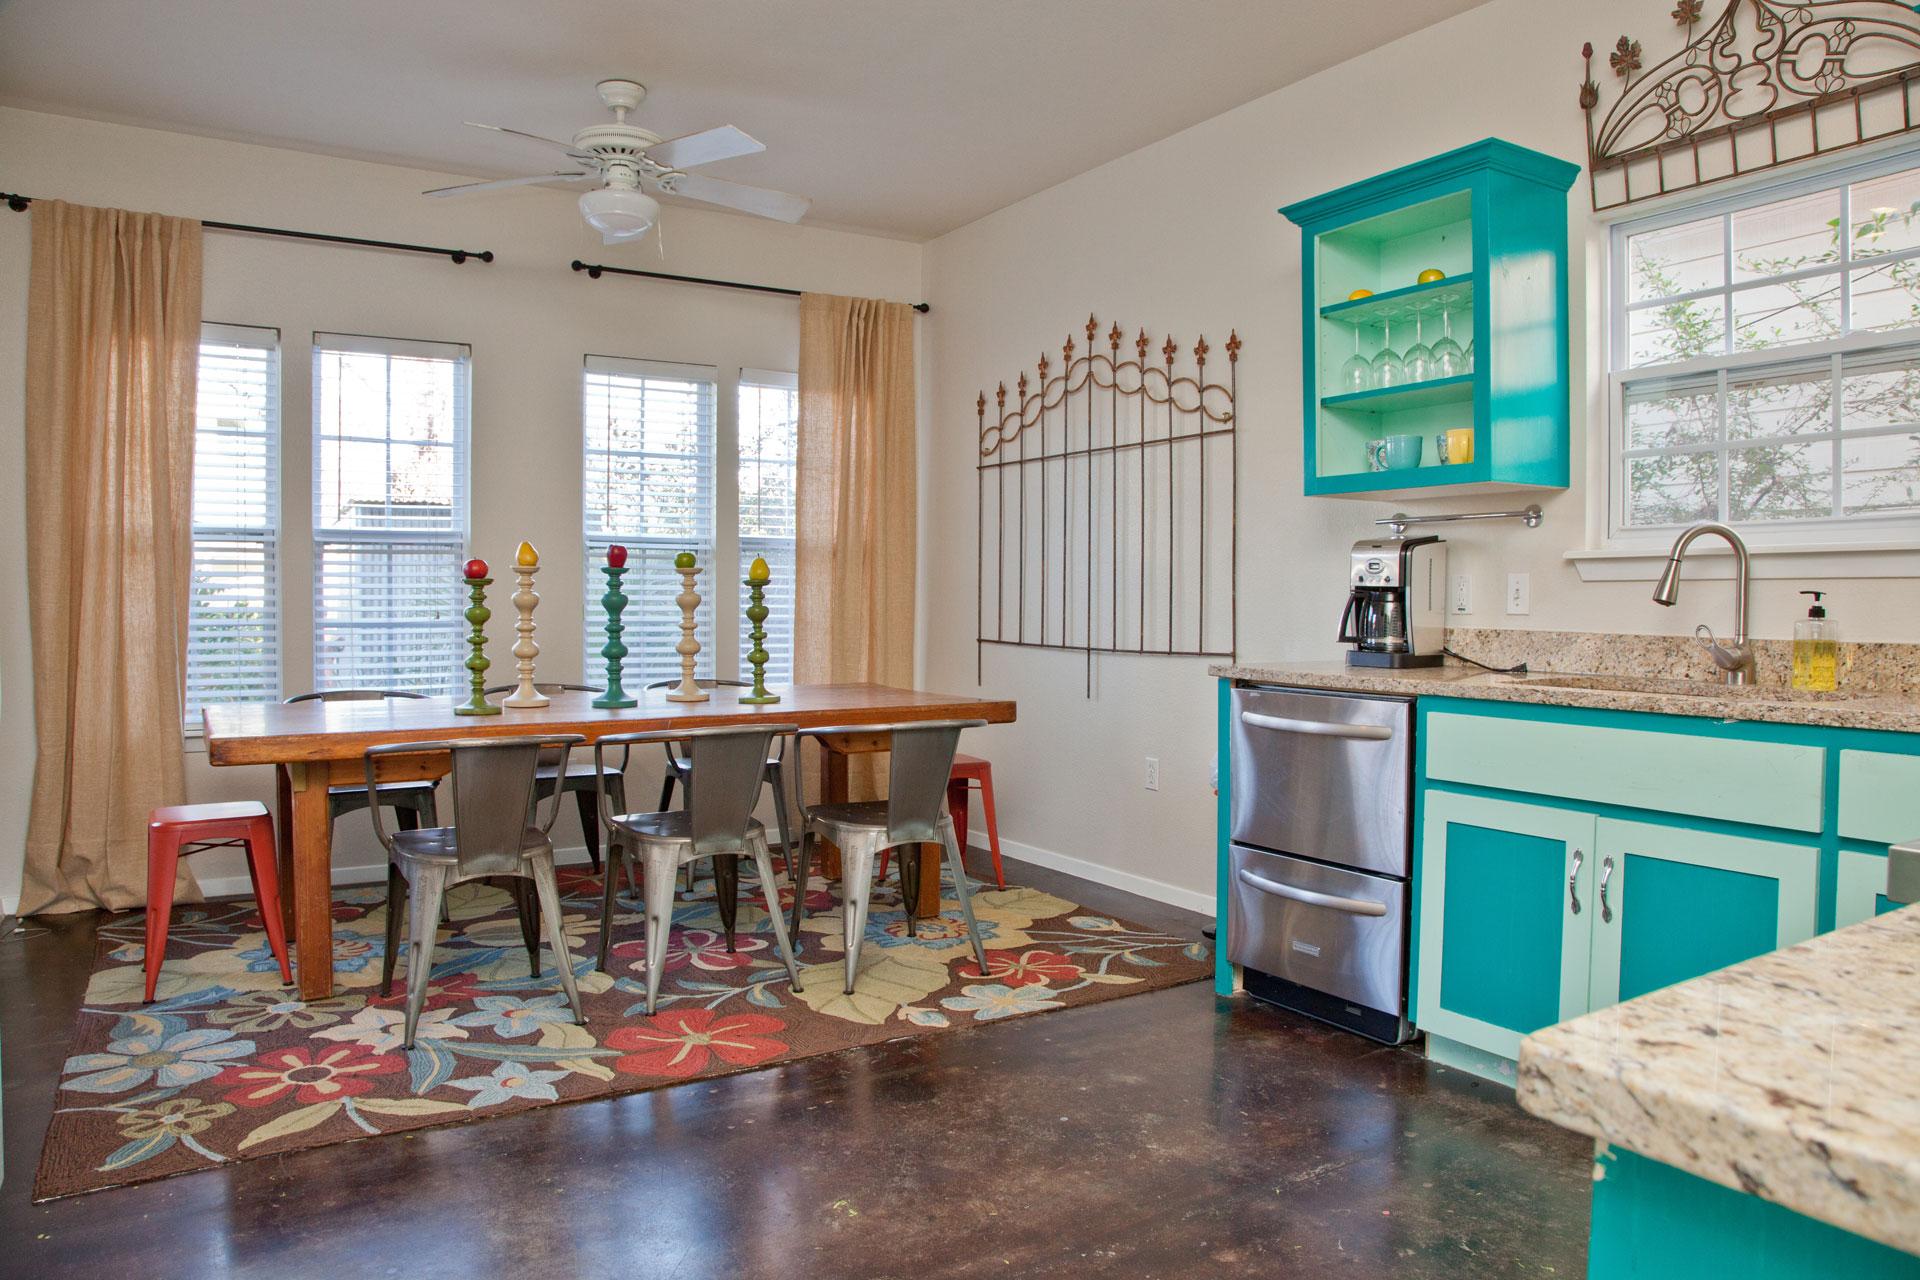 East Austin Vacation Rental Kitchen